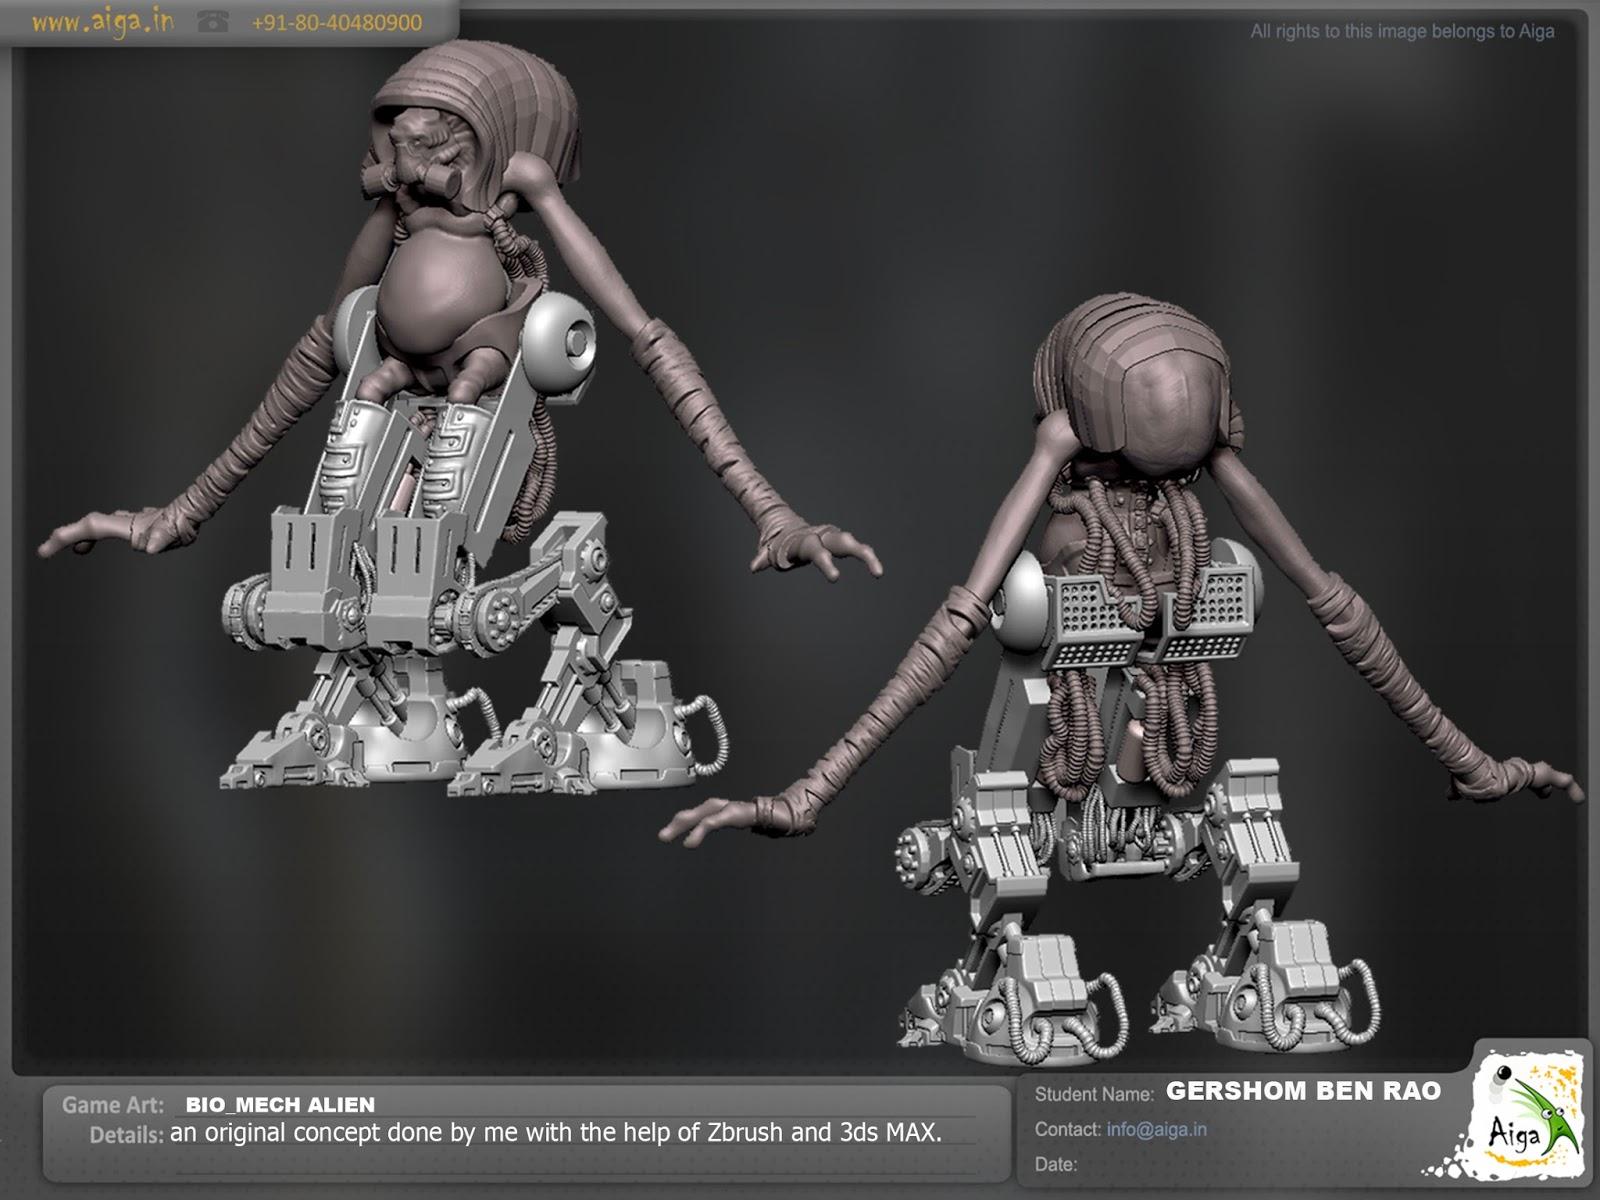 Gershom Ben Rao's Portfolio (Game Artist/Digital Sculptor